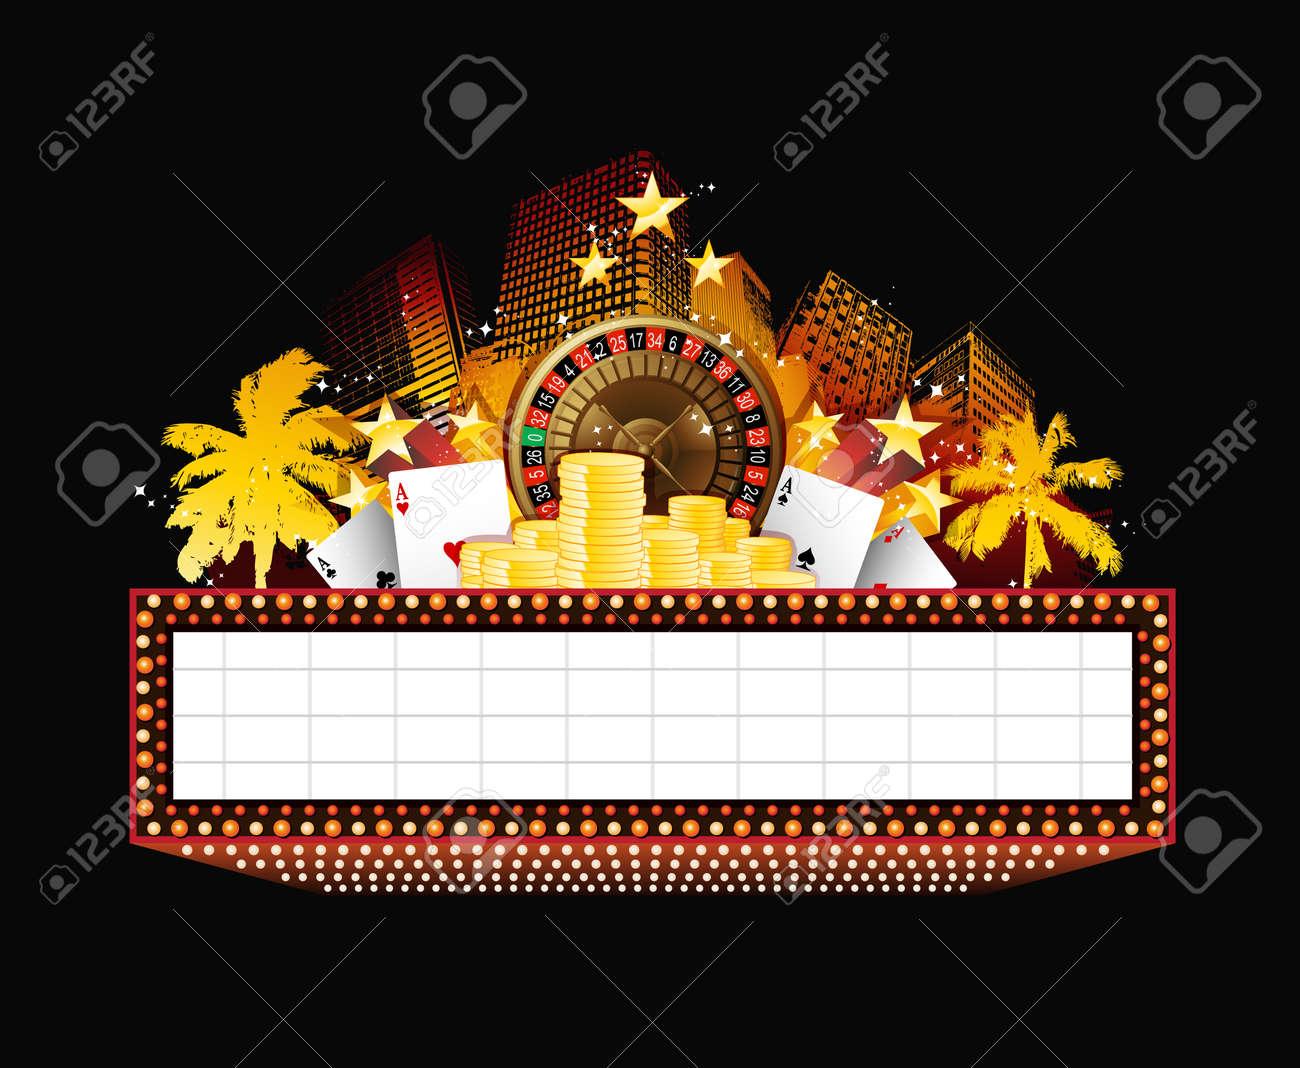 Brightly vintage glowing retro casino neon sign - 51224341